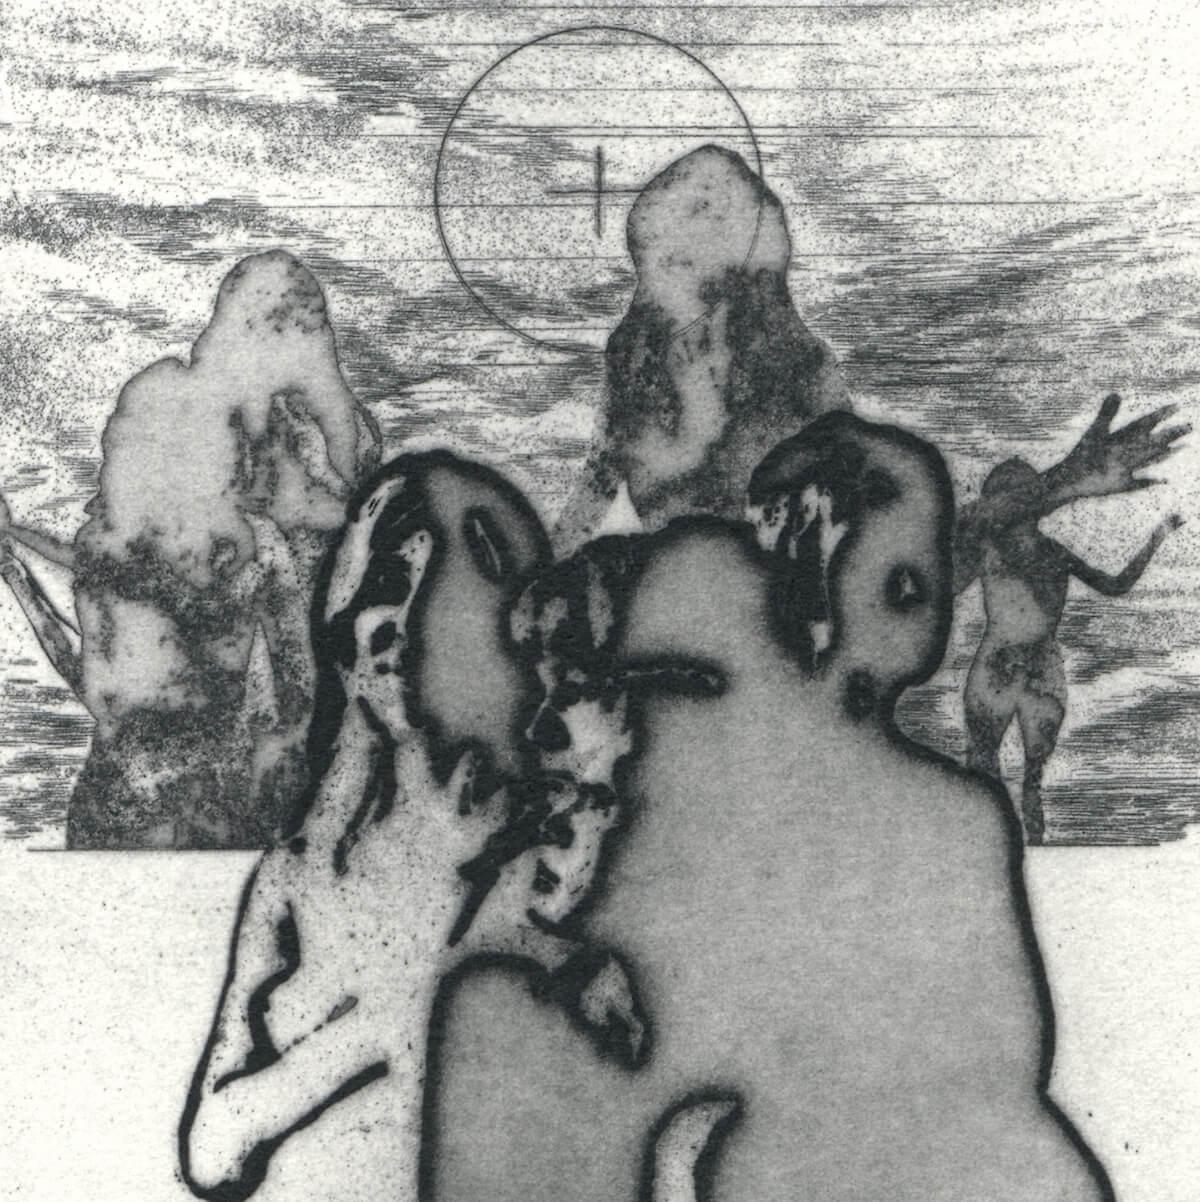 Corneliusが考える「音の構造物」。50歳を迎える手前にリリースした新アルバムについて music180829-cornelius-sound-2